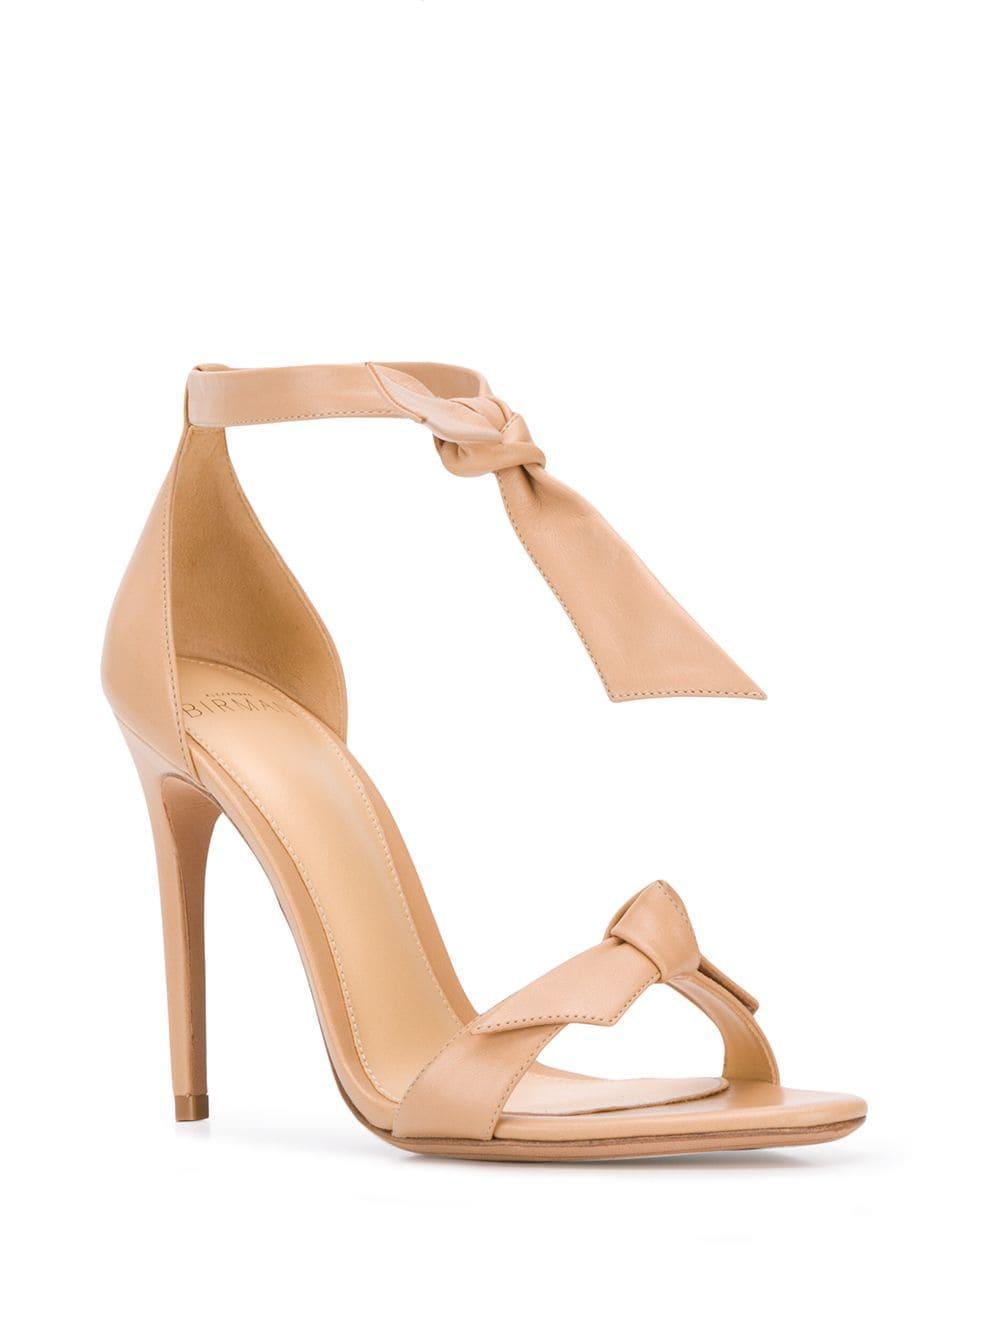 3ecfee079bd6 Lyst - Alexandre Birman Bow Tie Stiletto Sandals in Natural